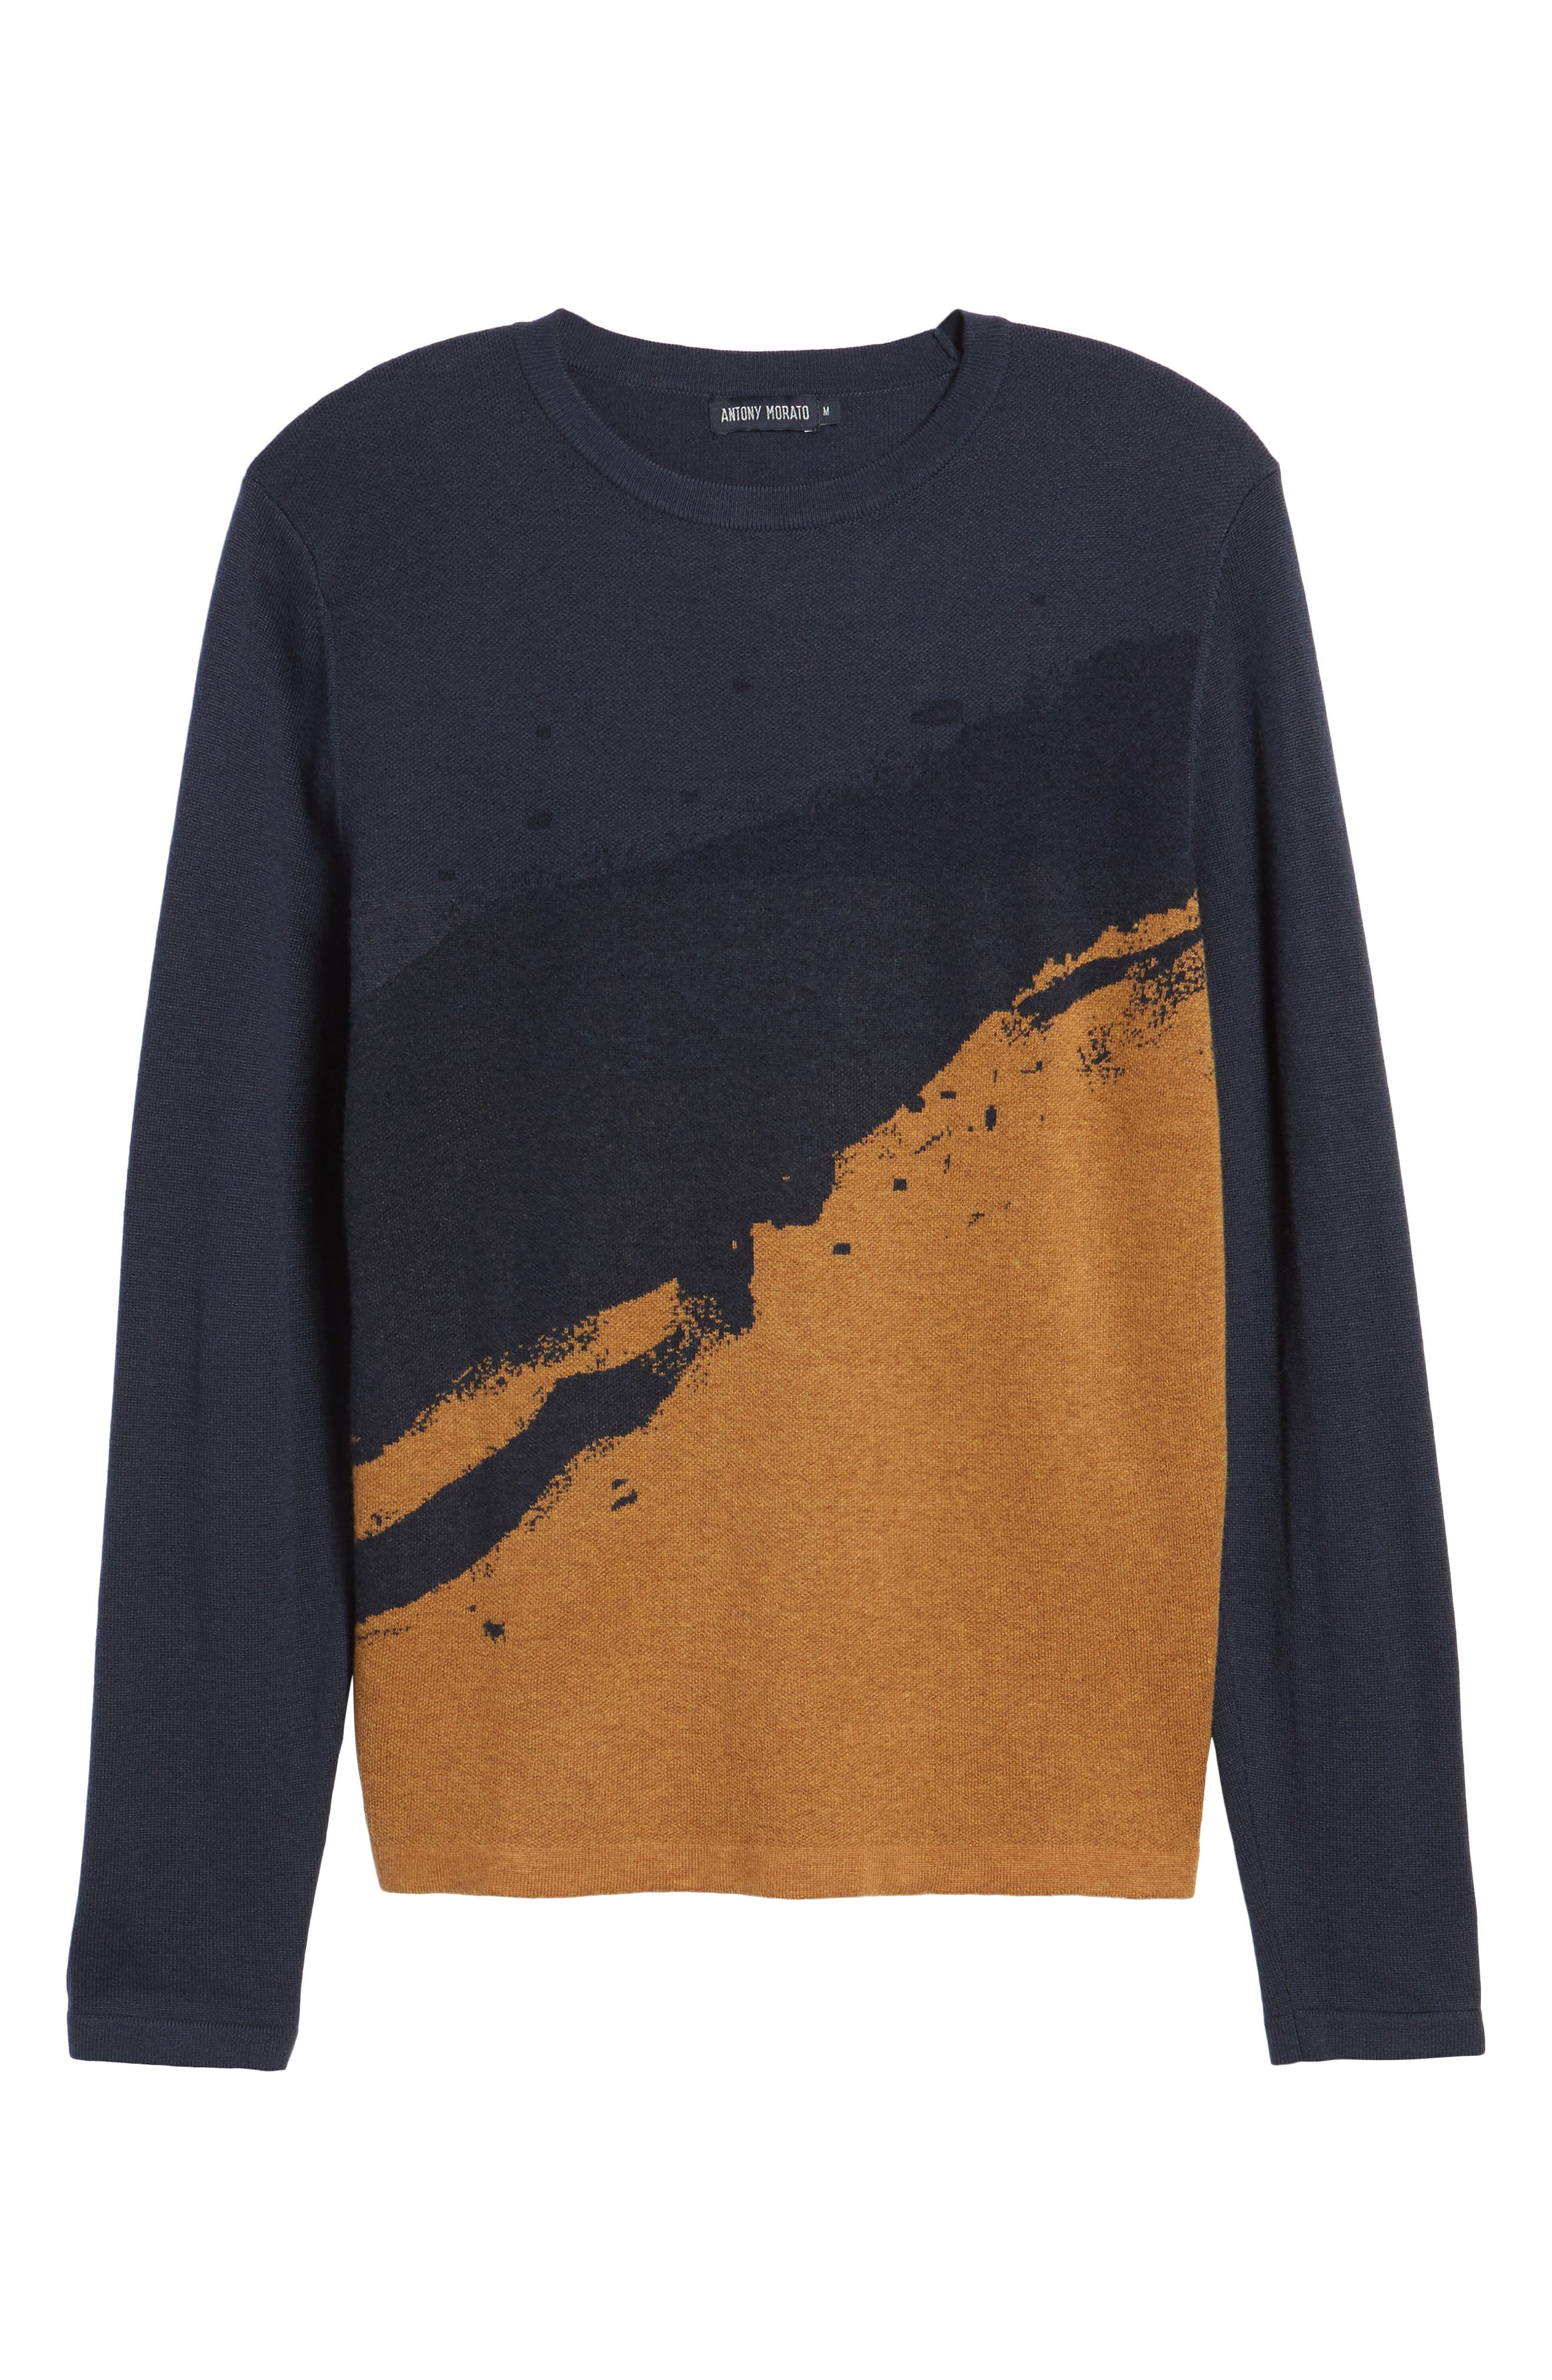 Anotny Morato Pattern Sweater,                             Alternate thumbnail 6, color,                             451